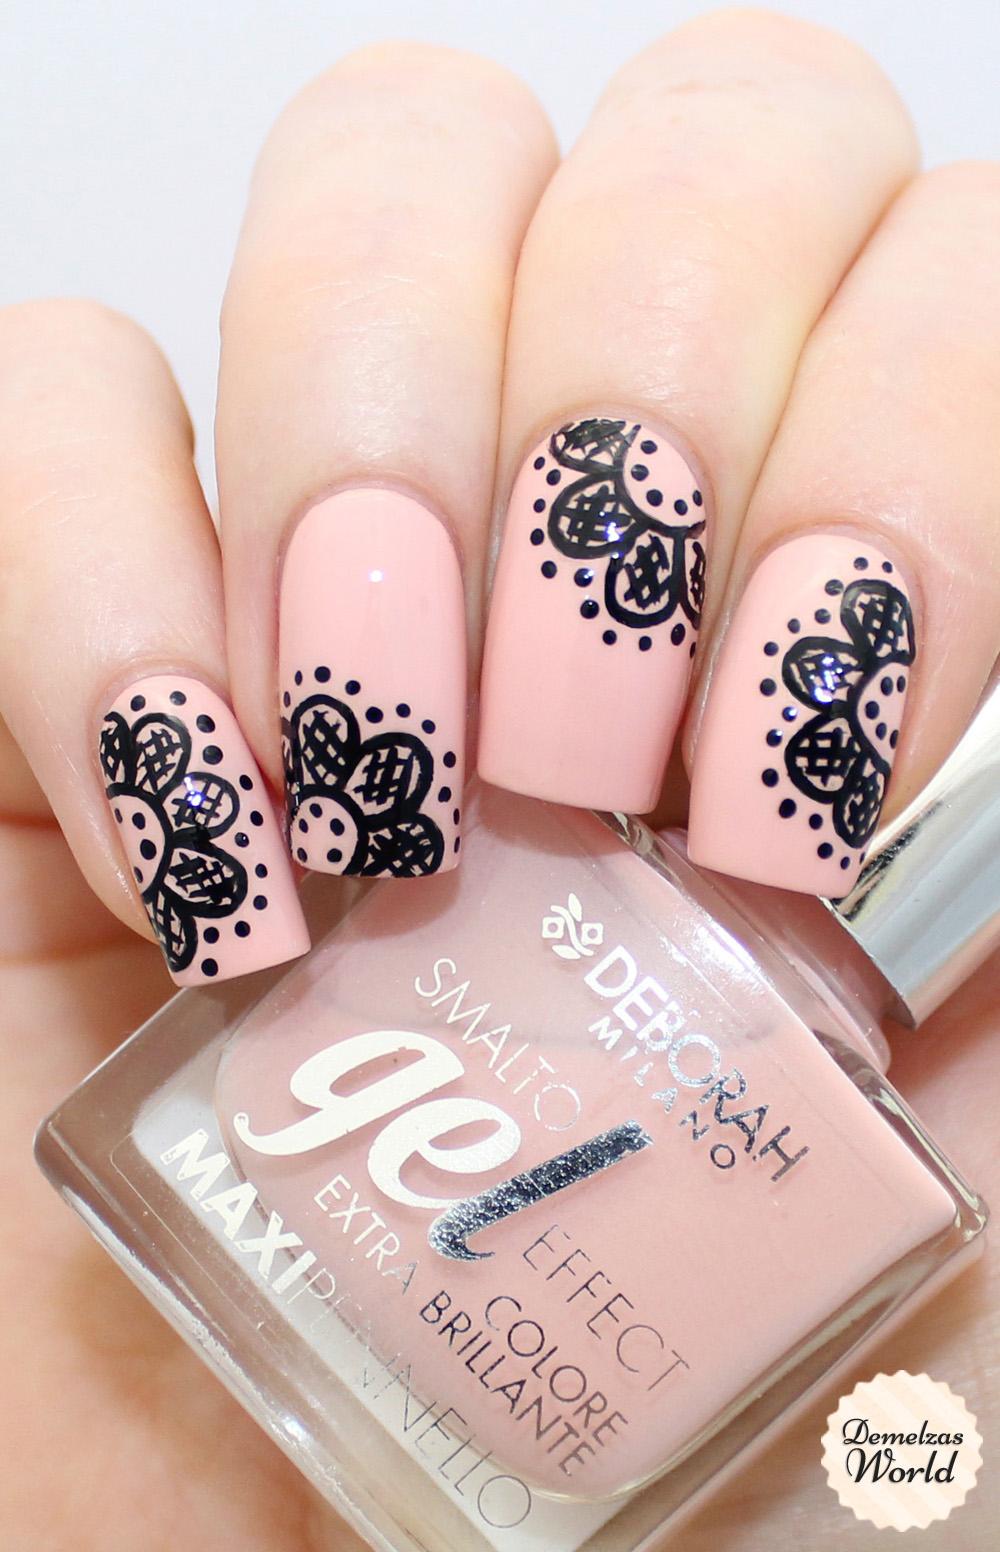 Lace Nail Art Video Tutorial for Deborah Milano Beauty Club ...